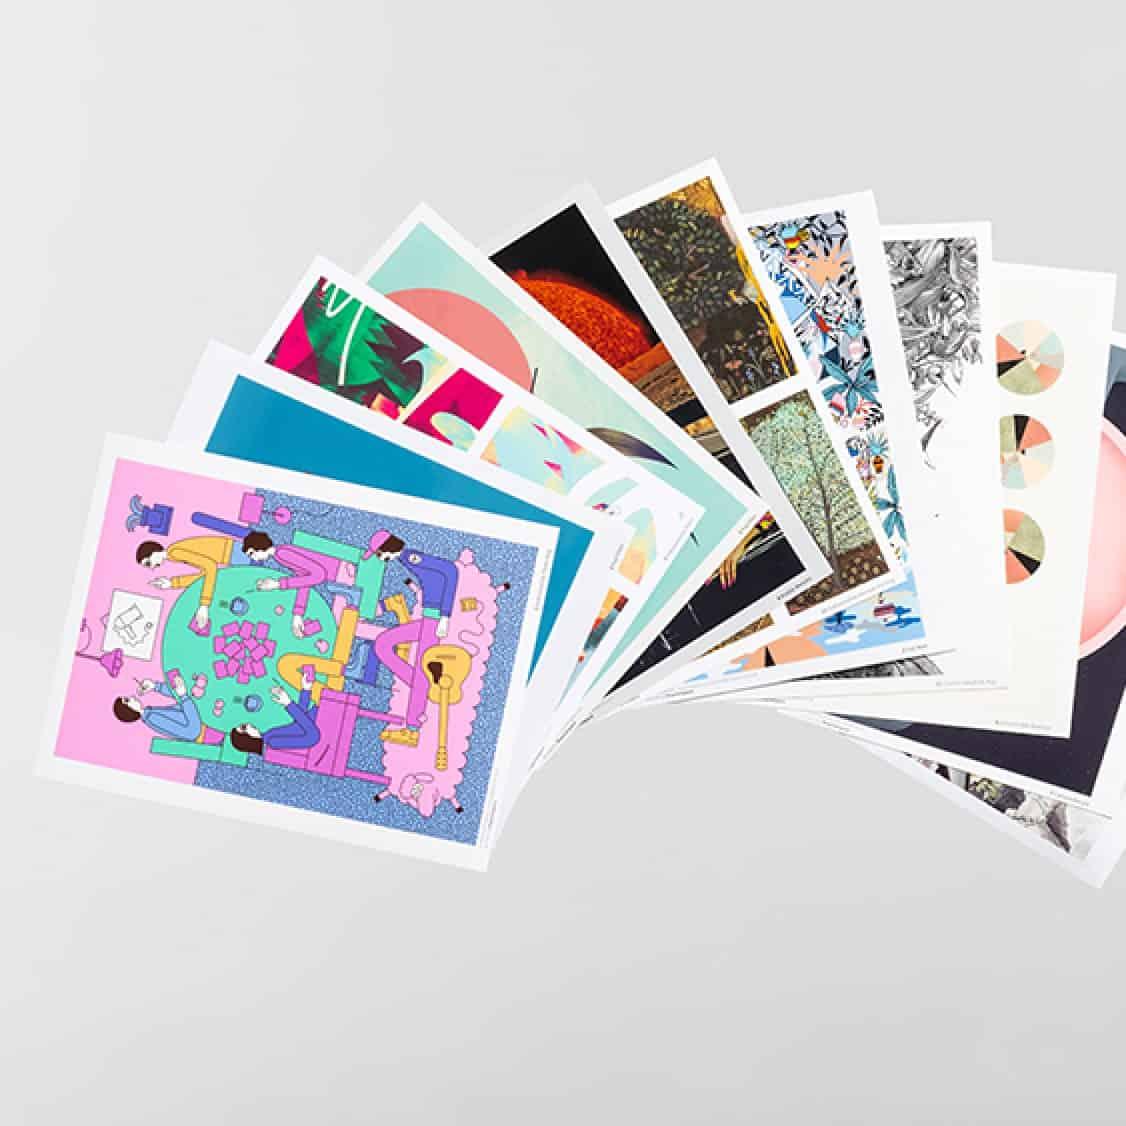 Gallery quality art prints